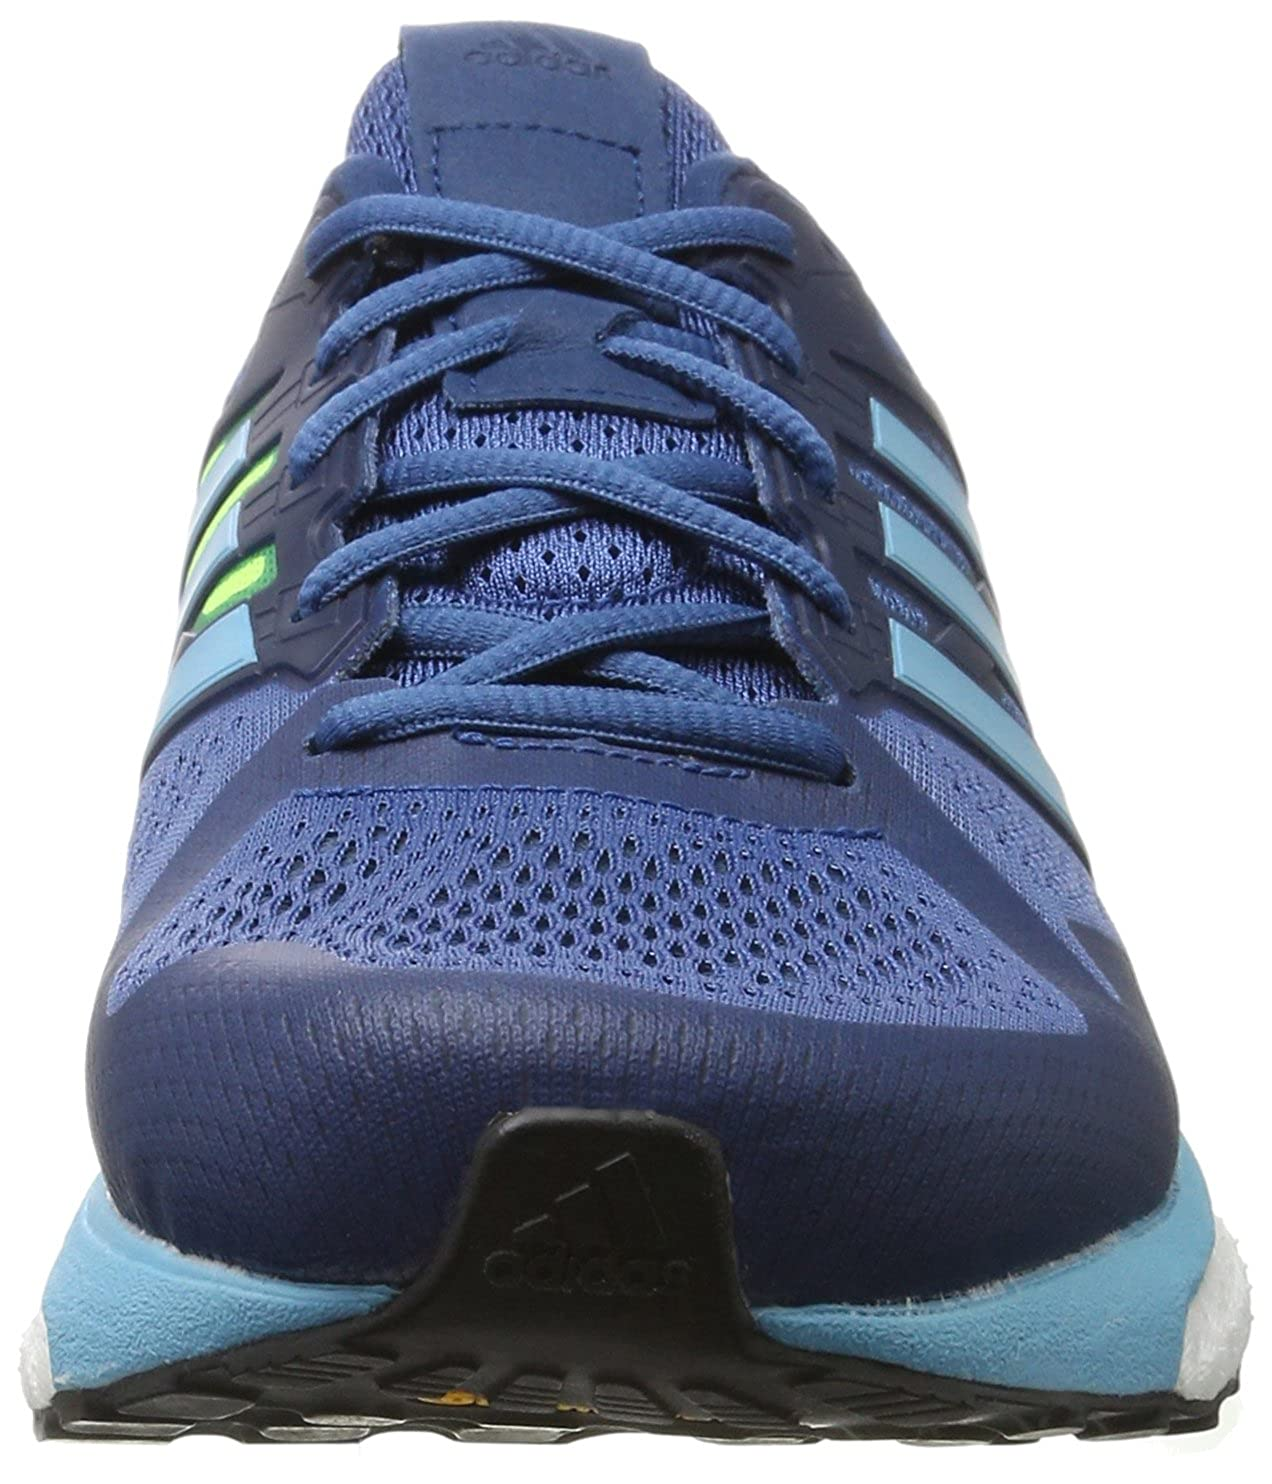 b662d8bfc01da0 adidas Men s Supernova St M Running Shoes  Amazon.co.uk  Shoes   Bags